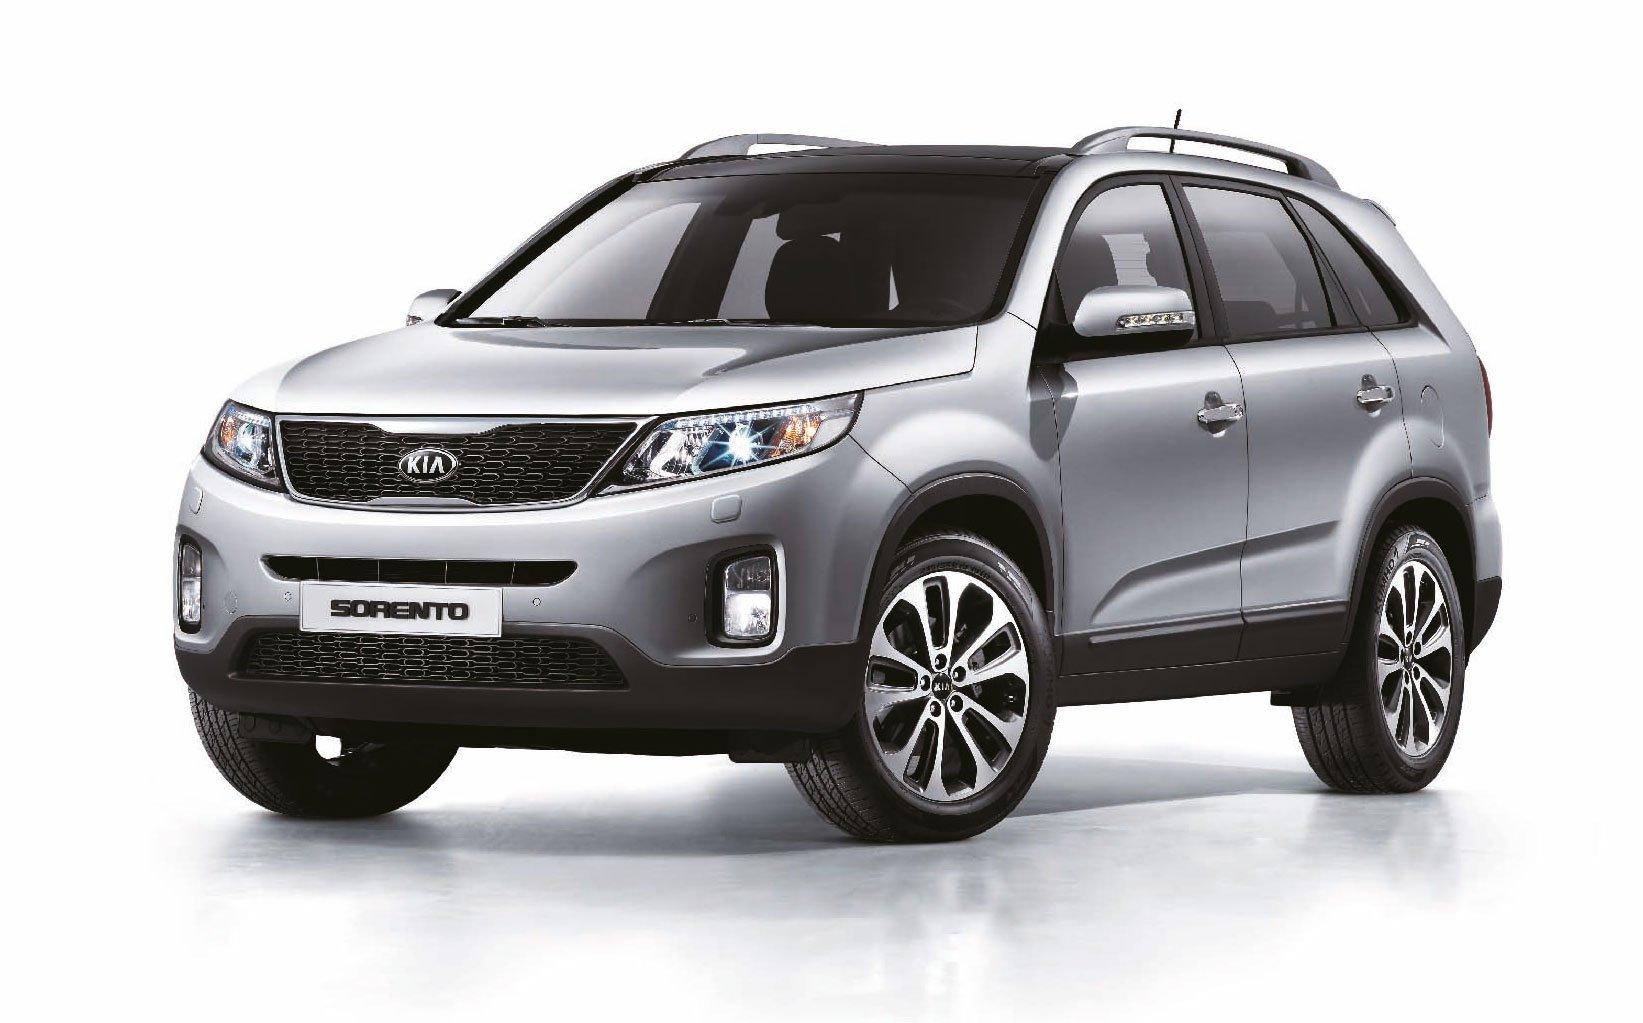 New Kia Sorento launched - 2.4L petrol, RM158,888